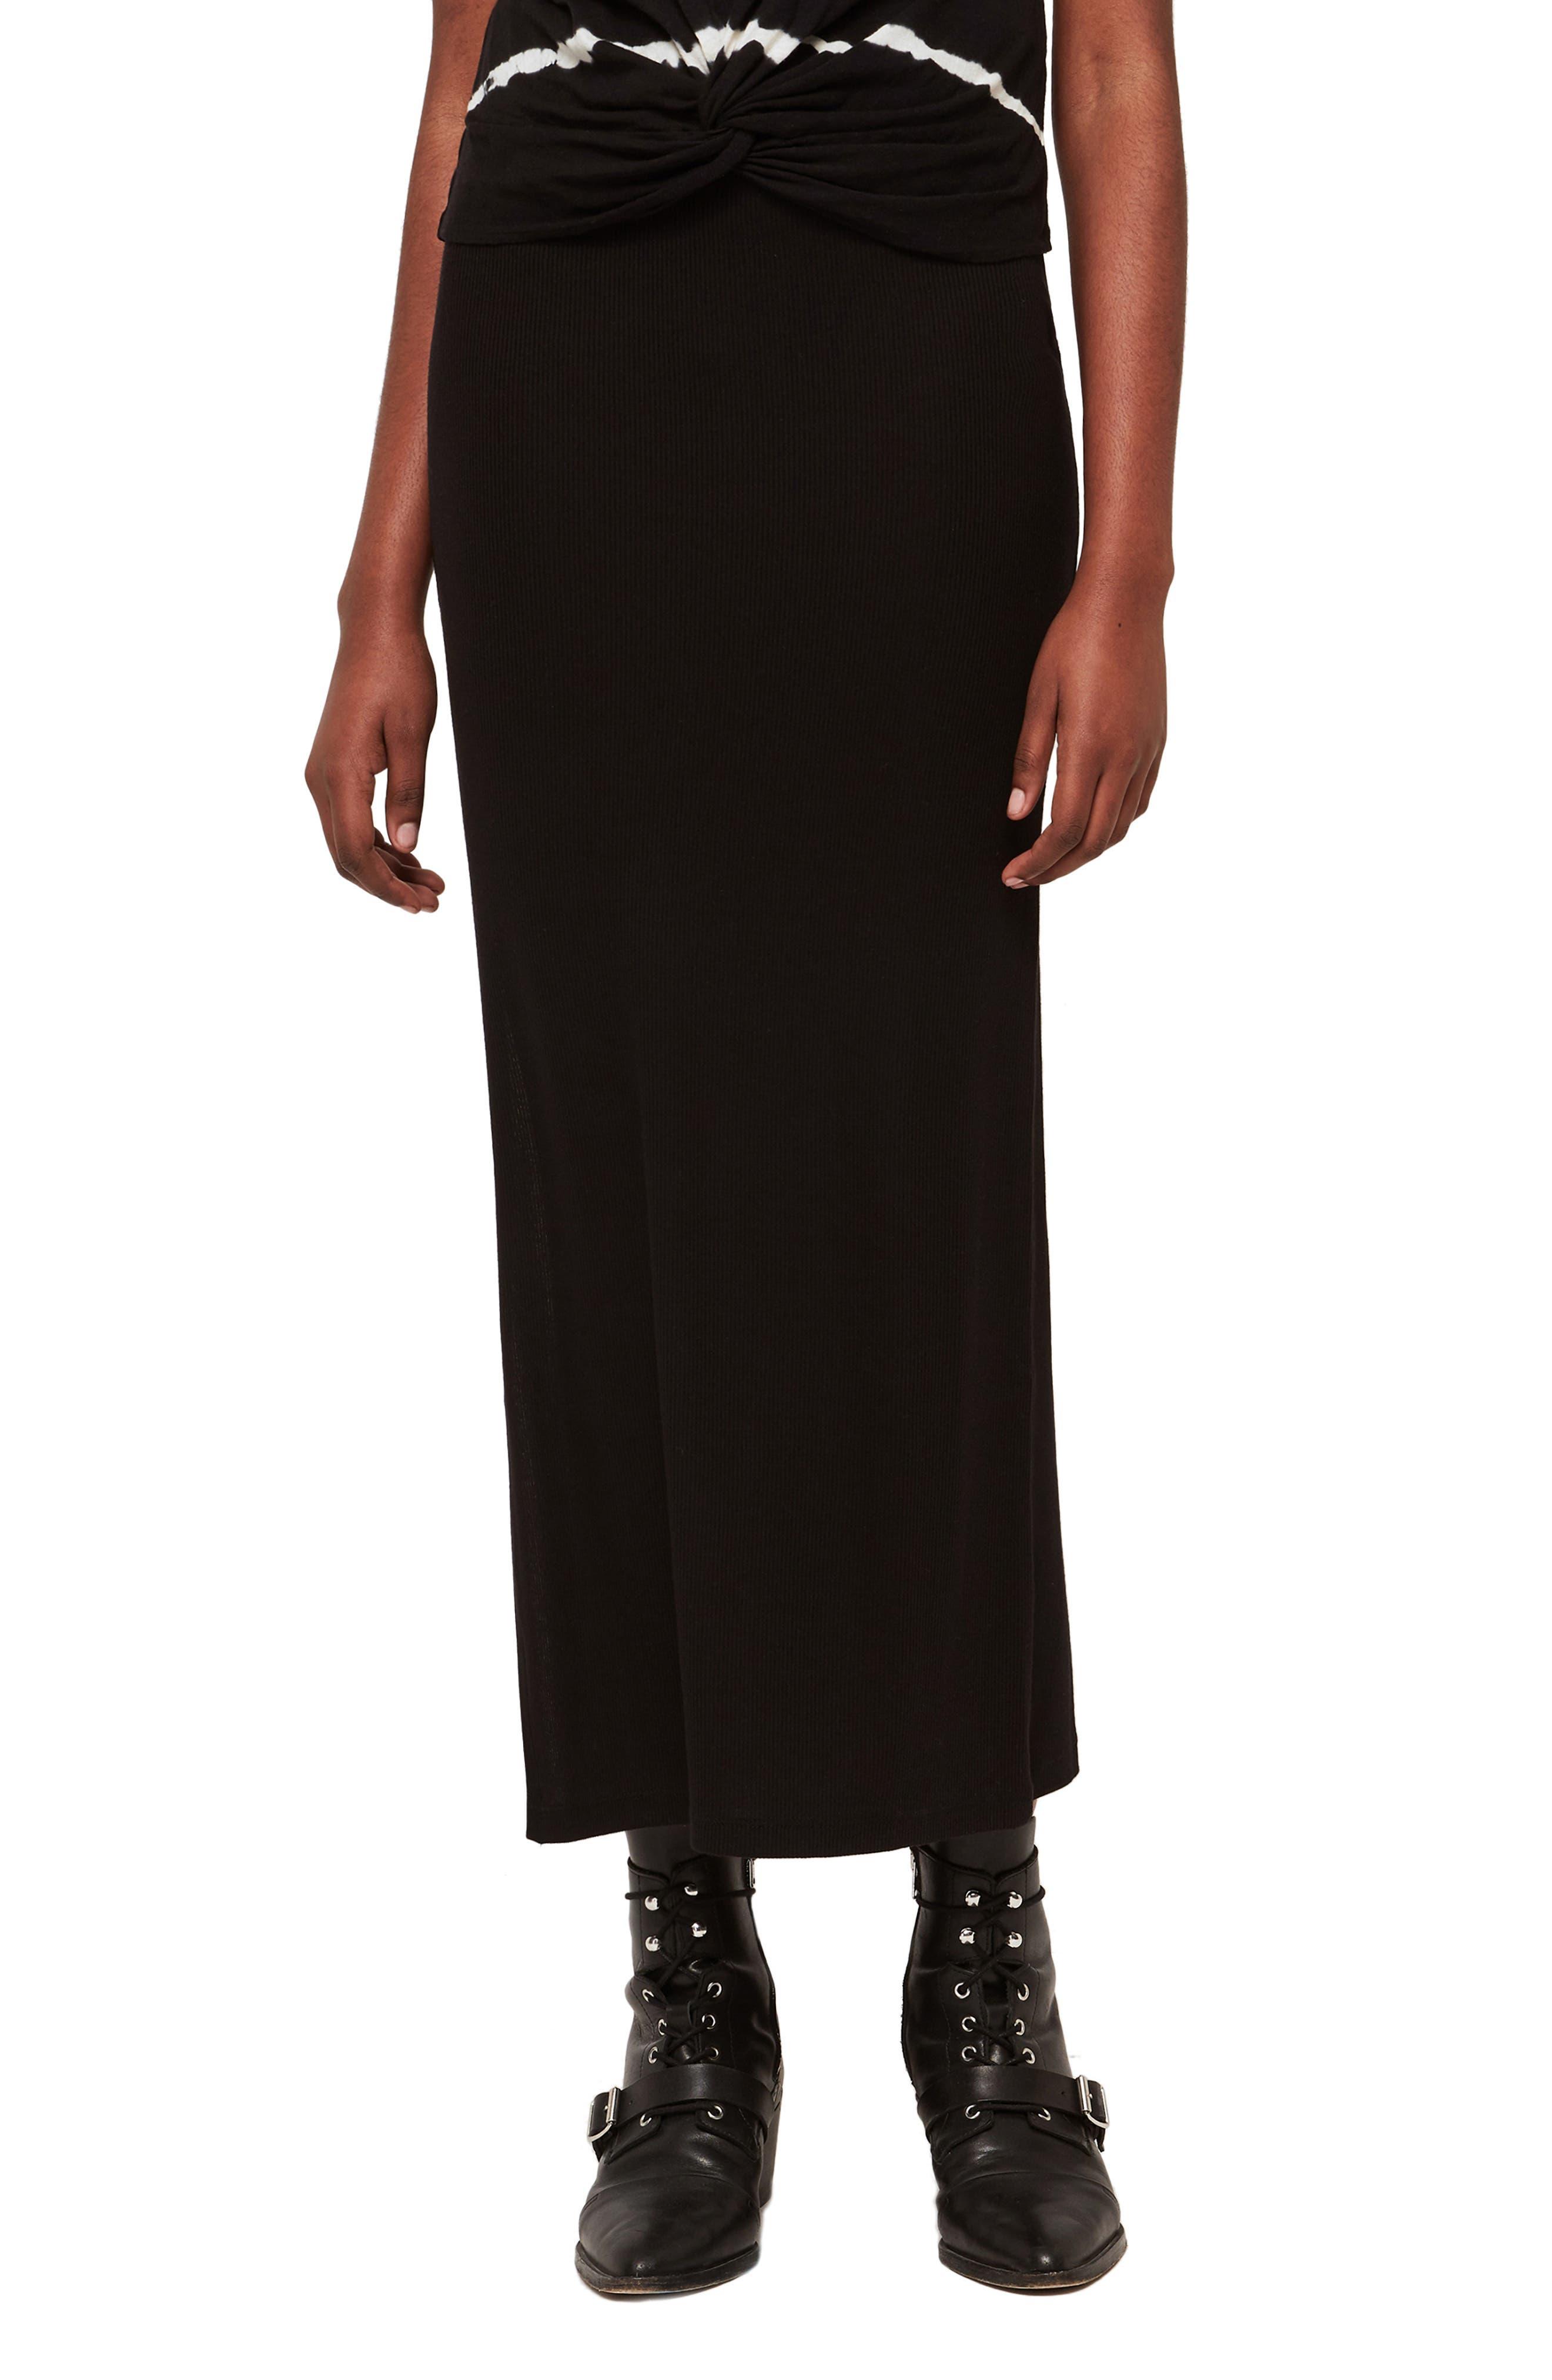 Allsaints Rina Maxi Skirt, Black